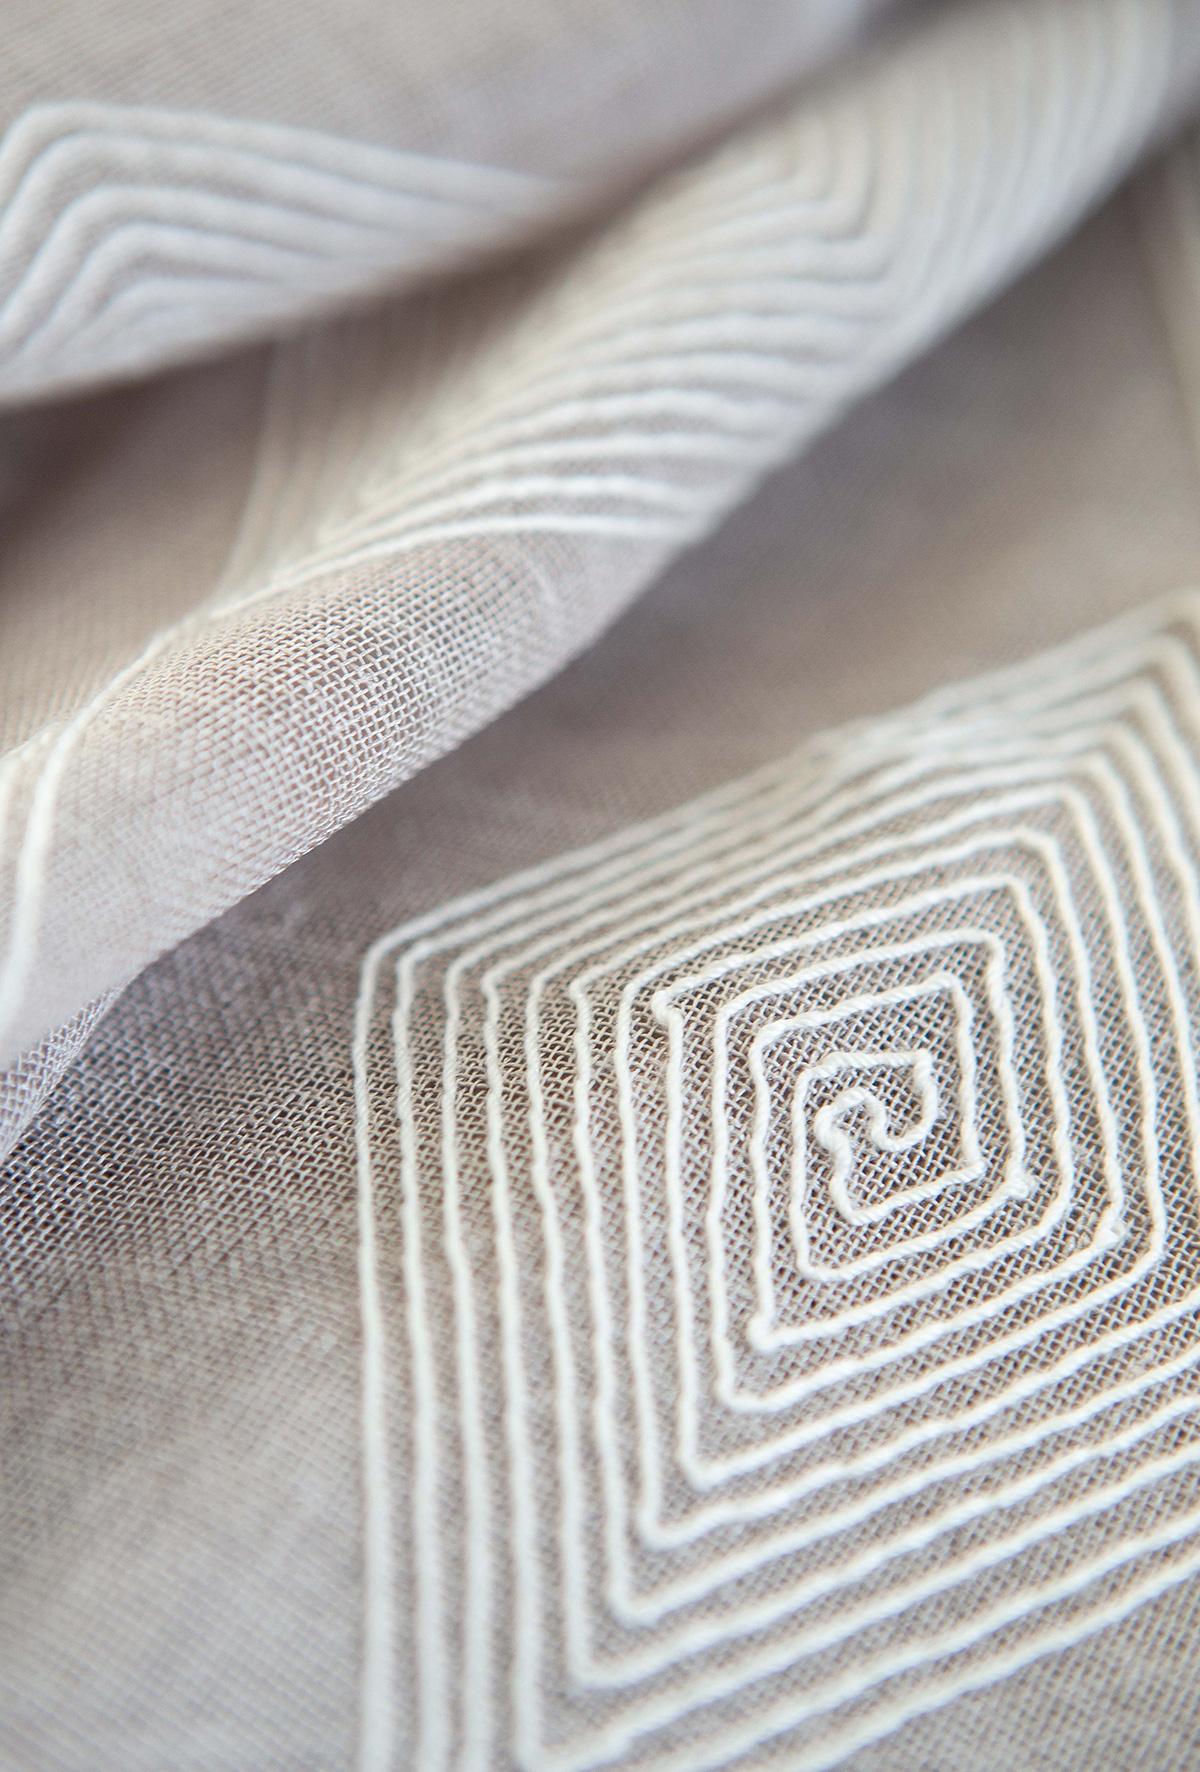 Rasch_Textil_Karma_Detail.jpg